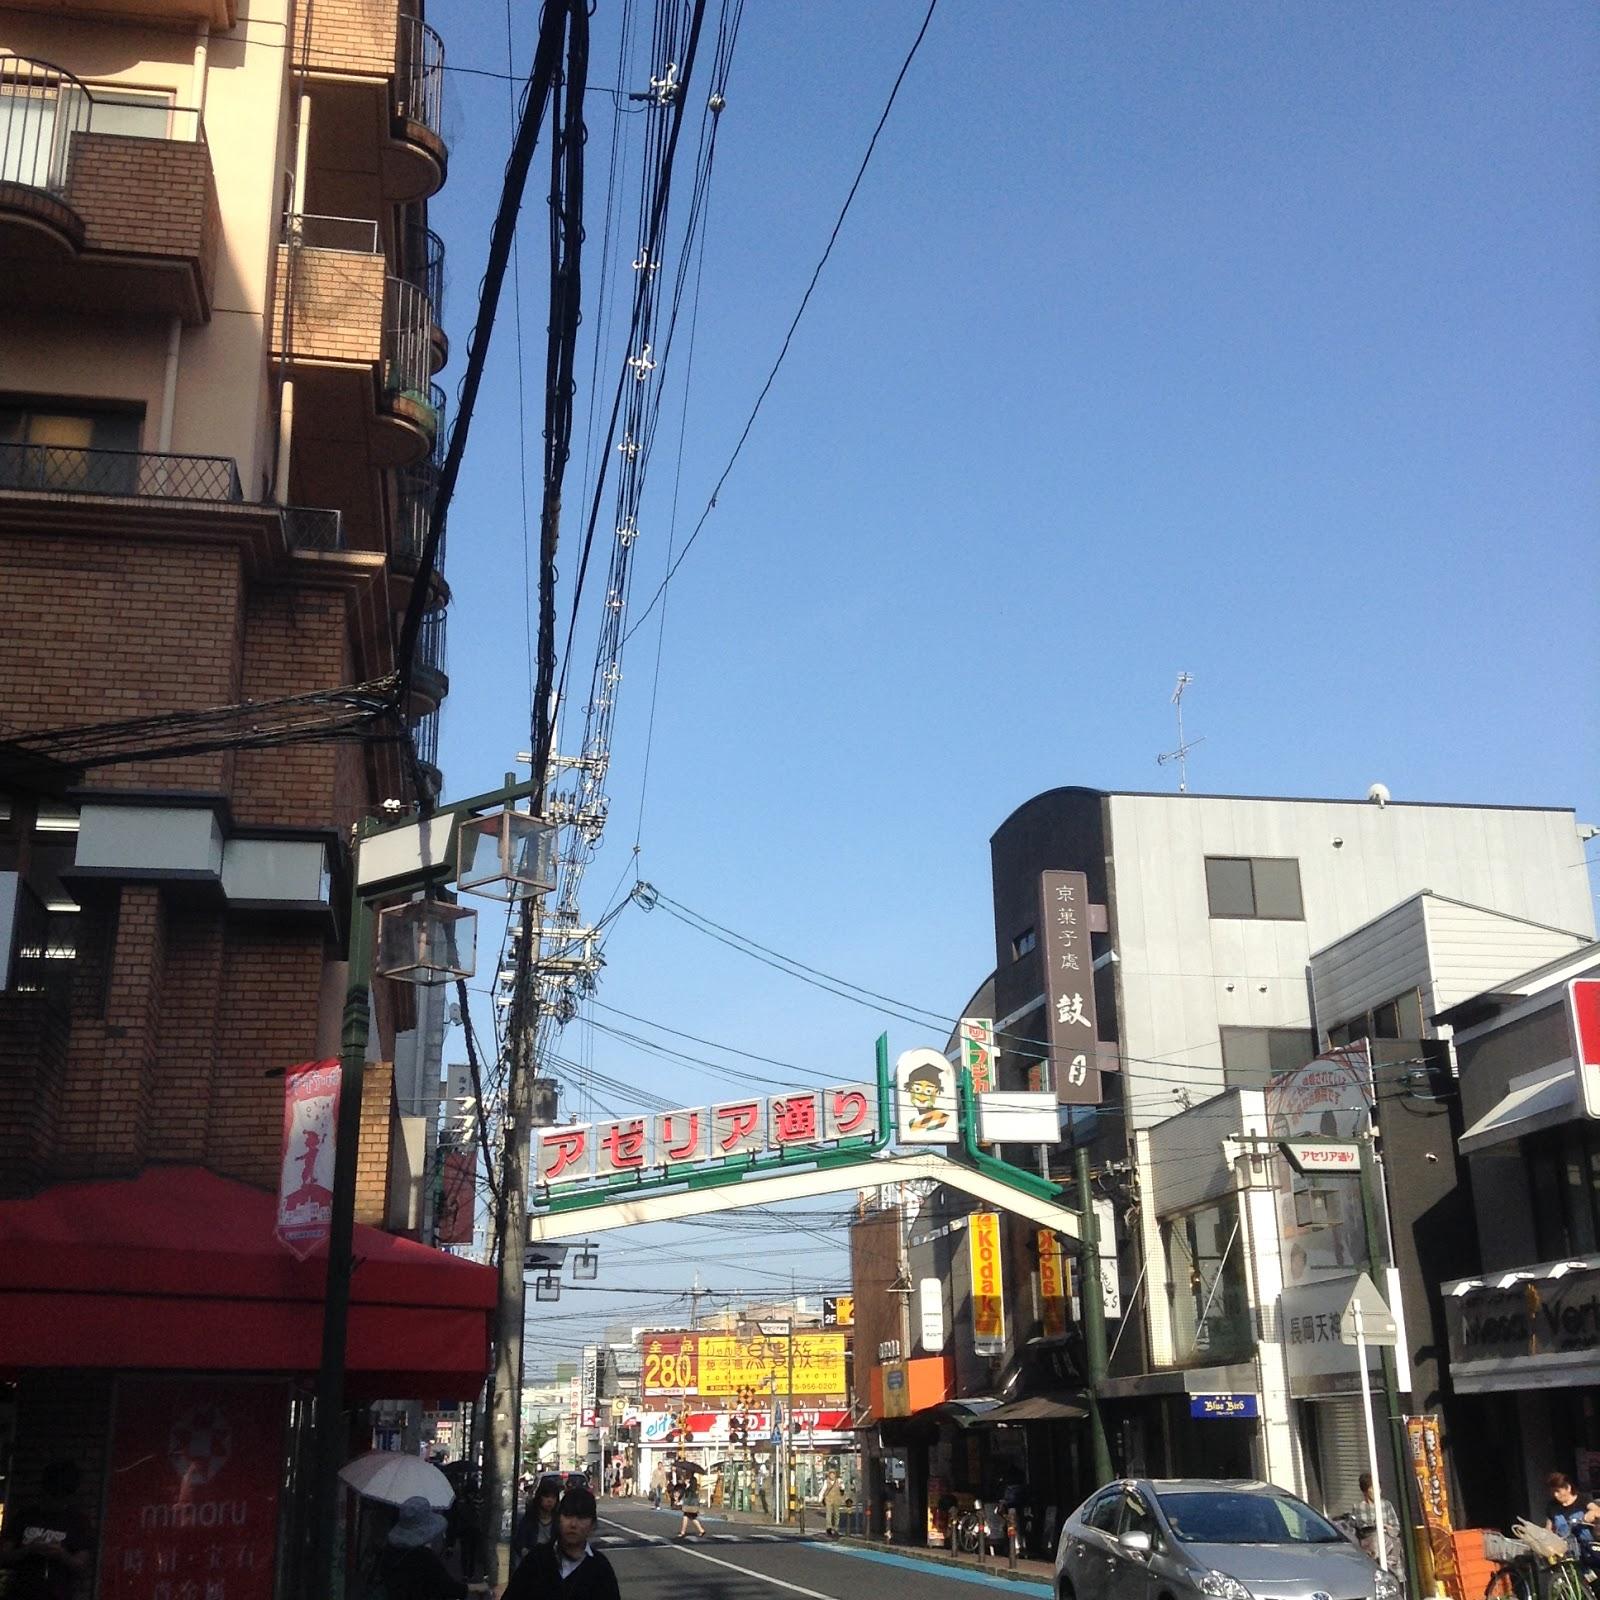 Japanese street Nagaoka